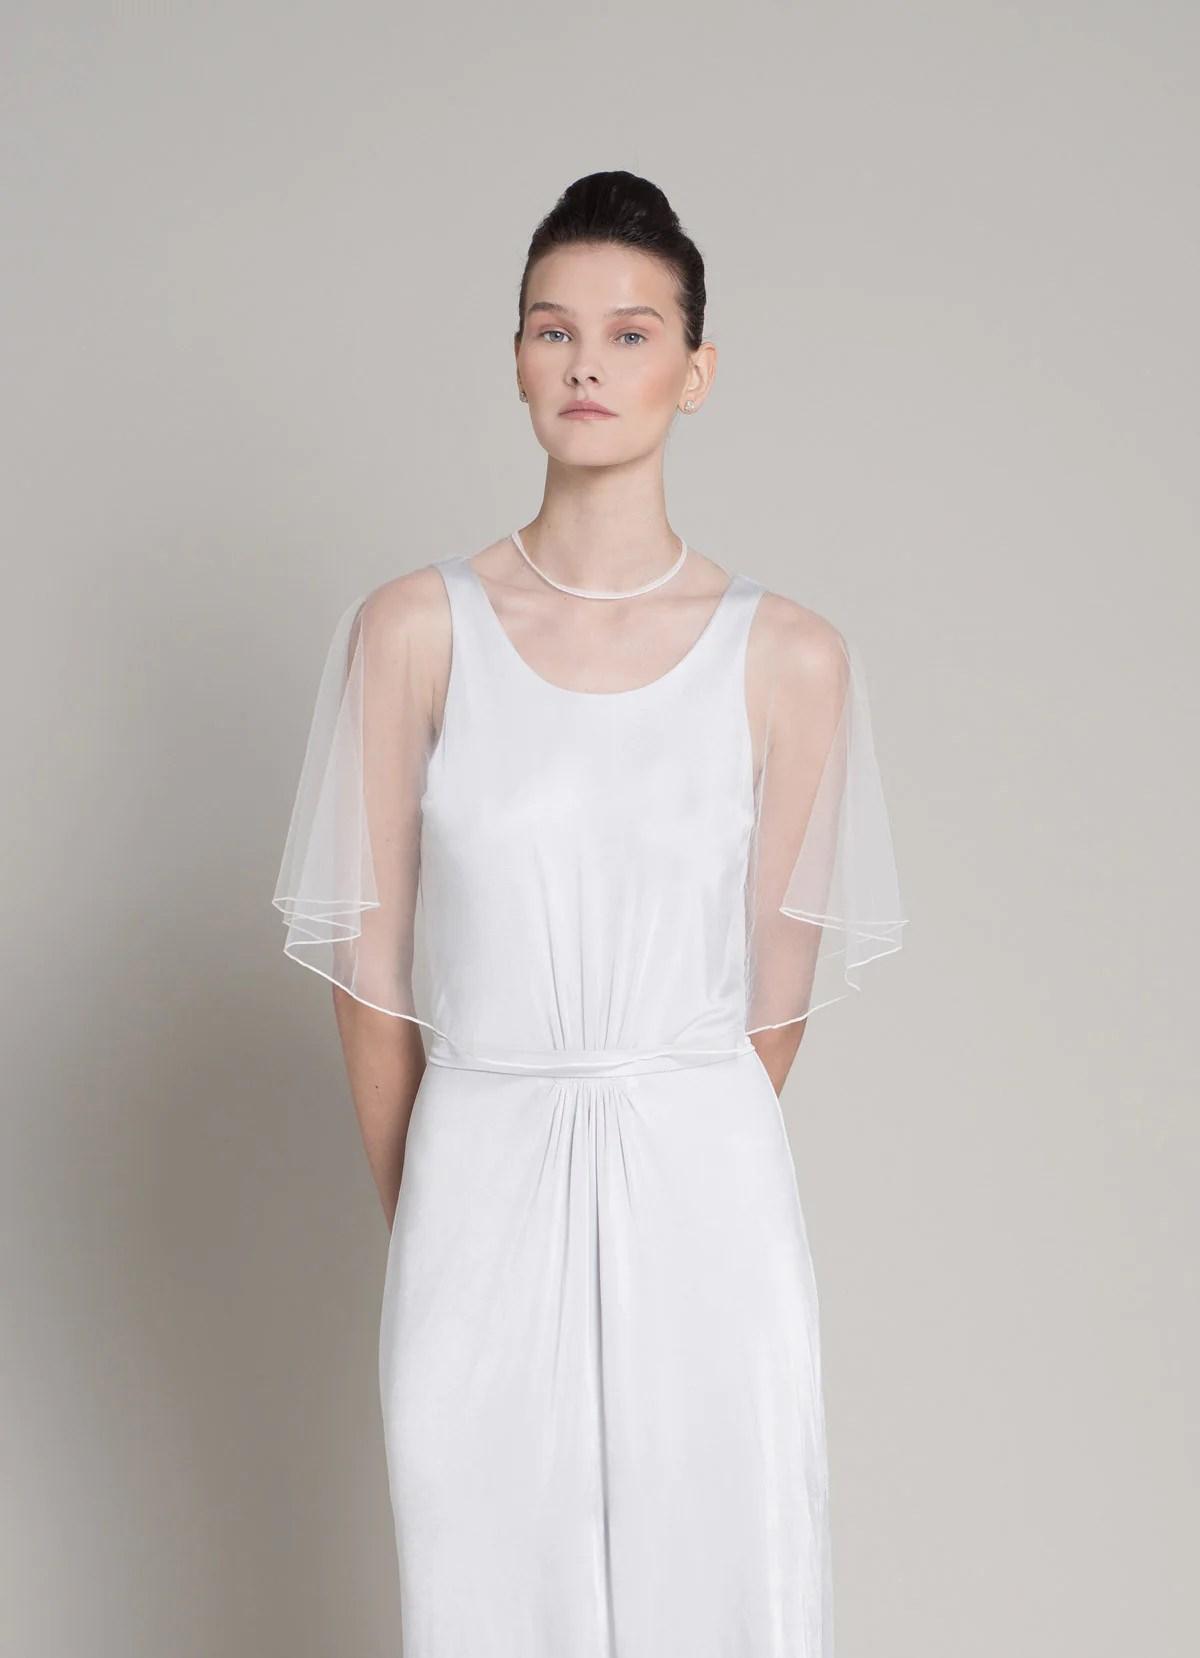 winter wedding dresses and capes wedding dress cape Winter Wedding Dresses And Capes 67